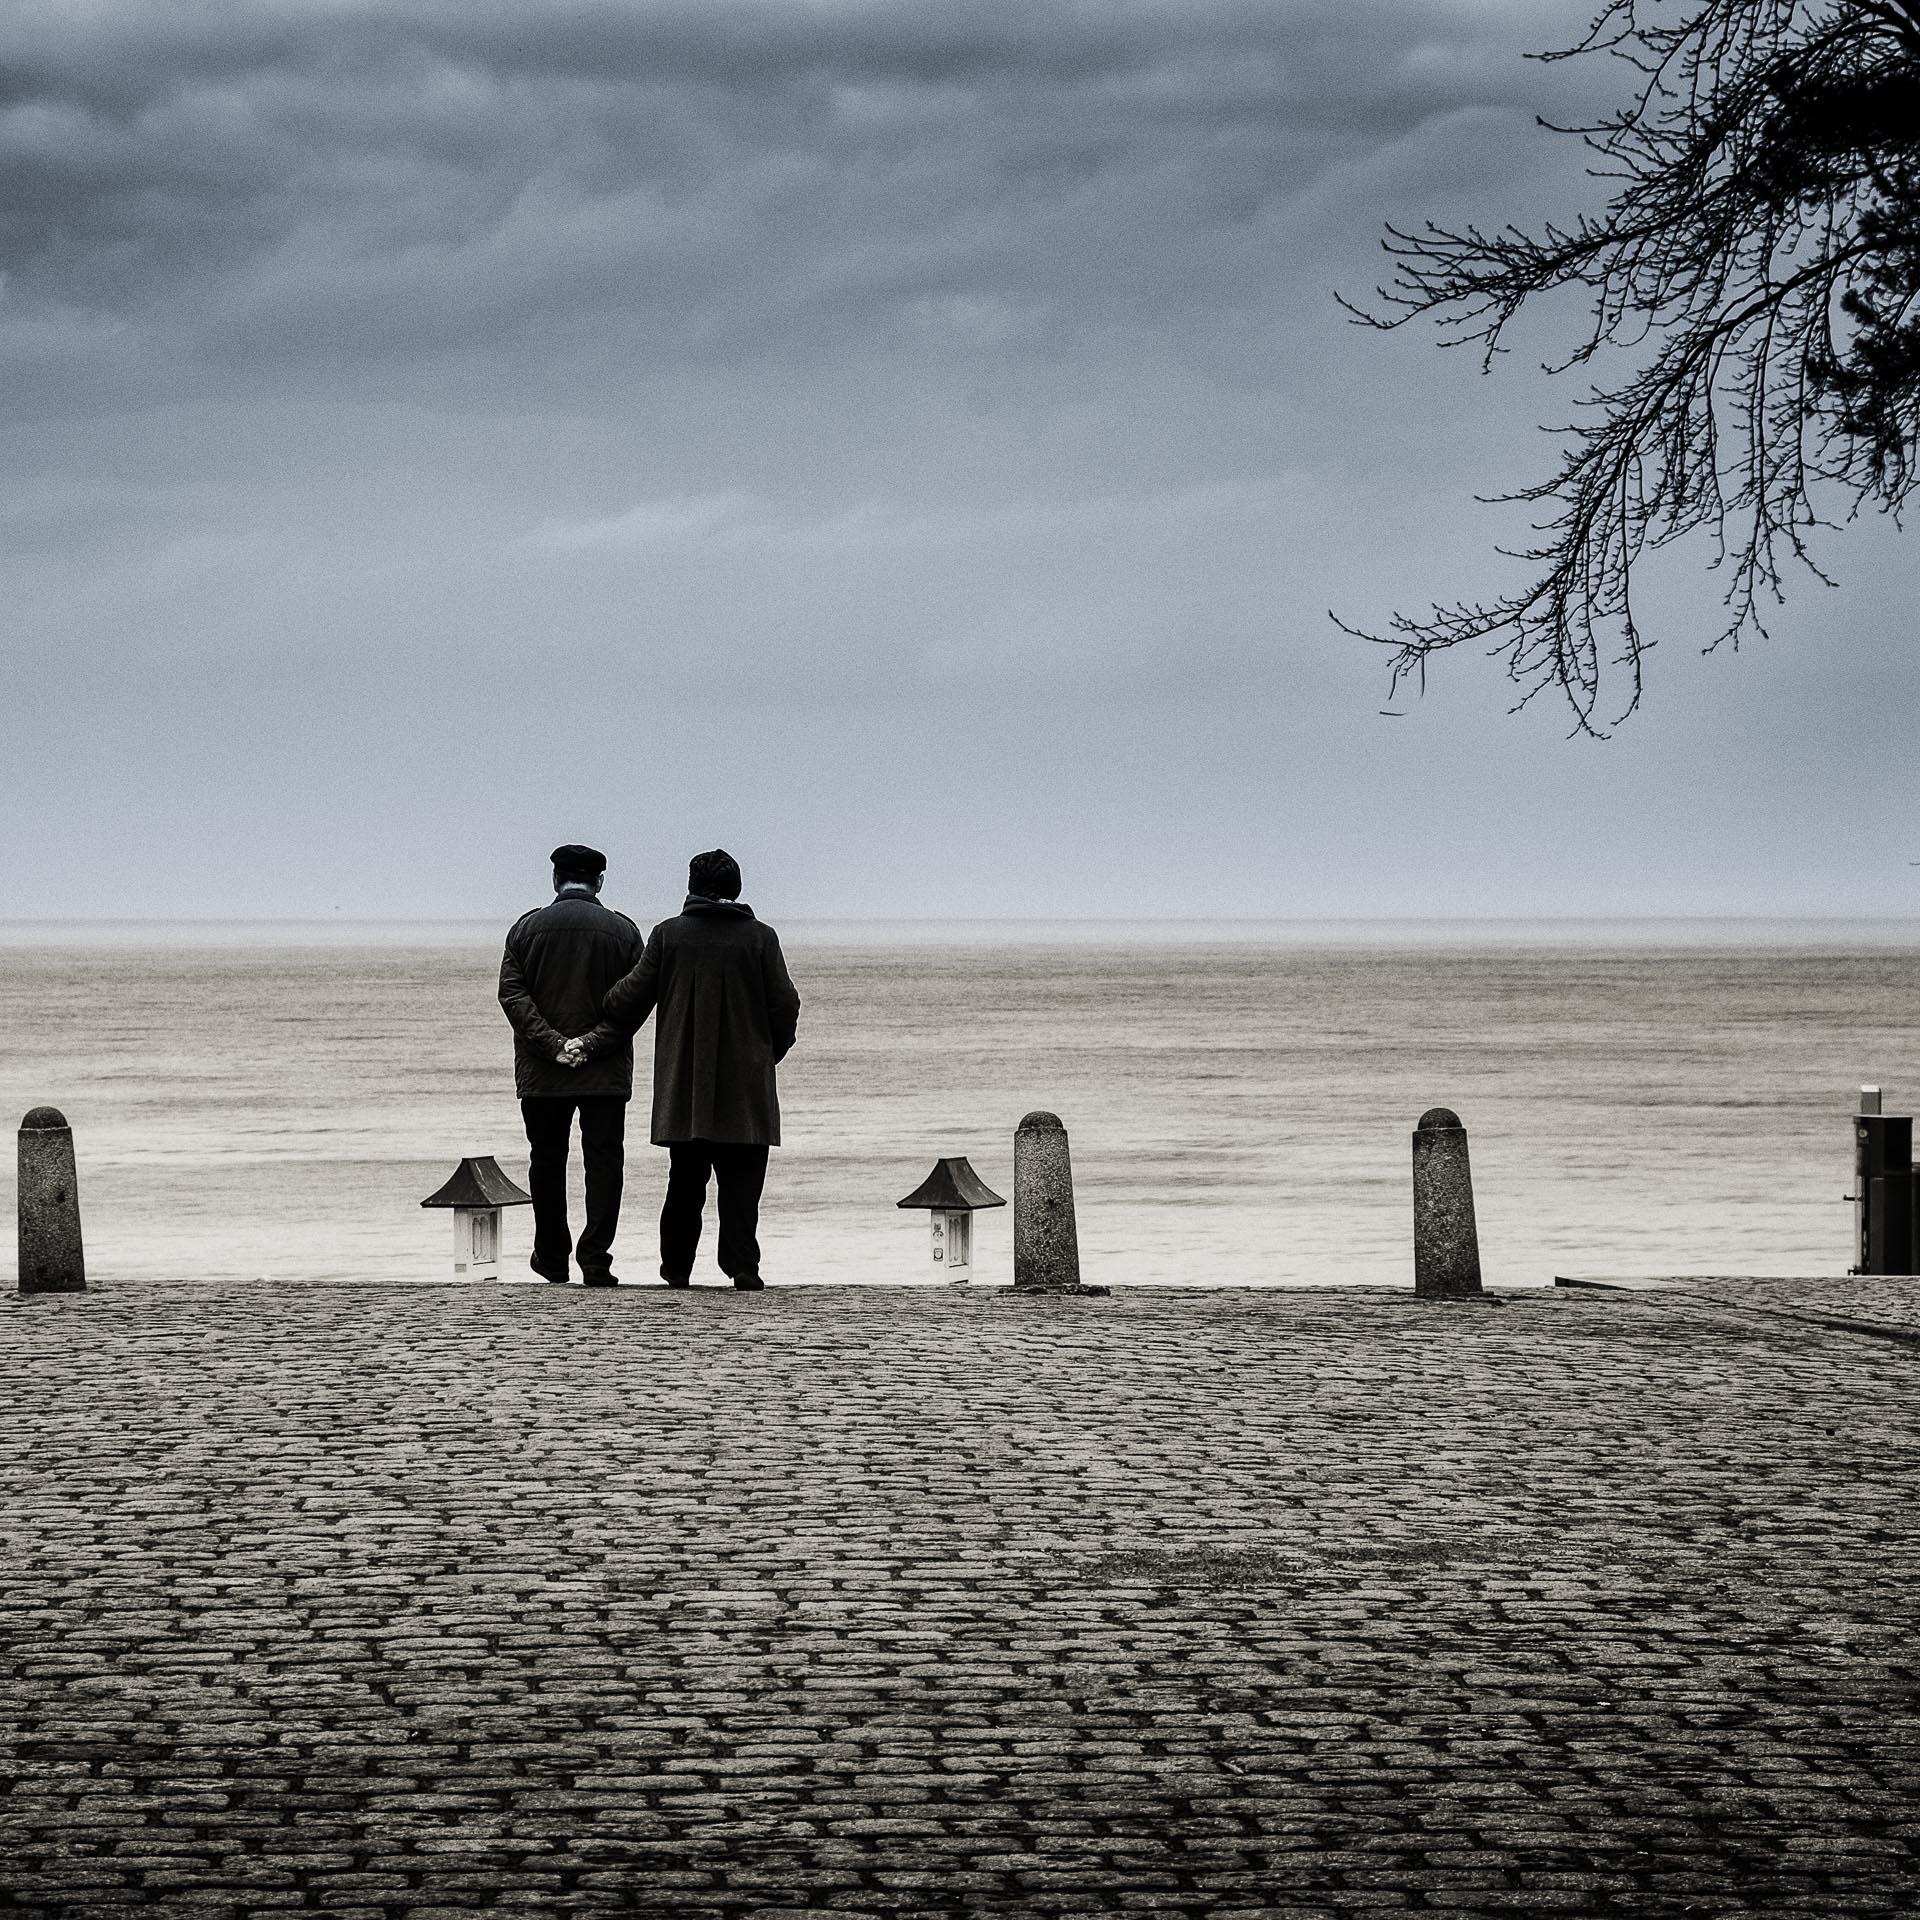 Altes Ehepaar was Spaziert